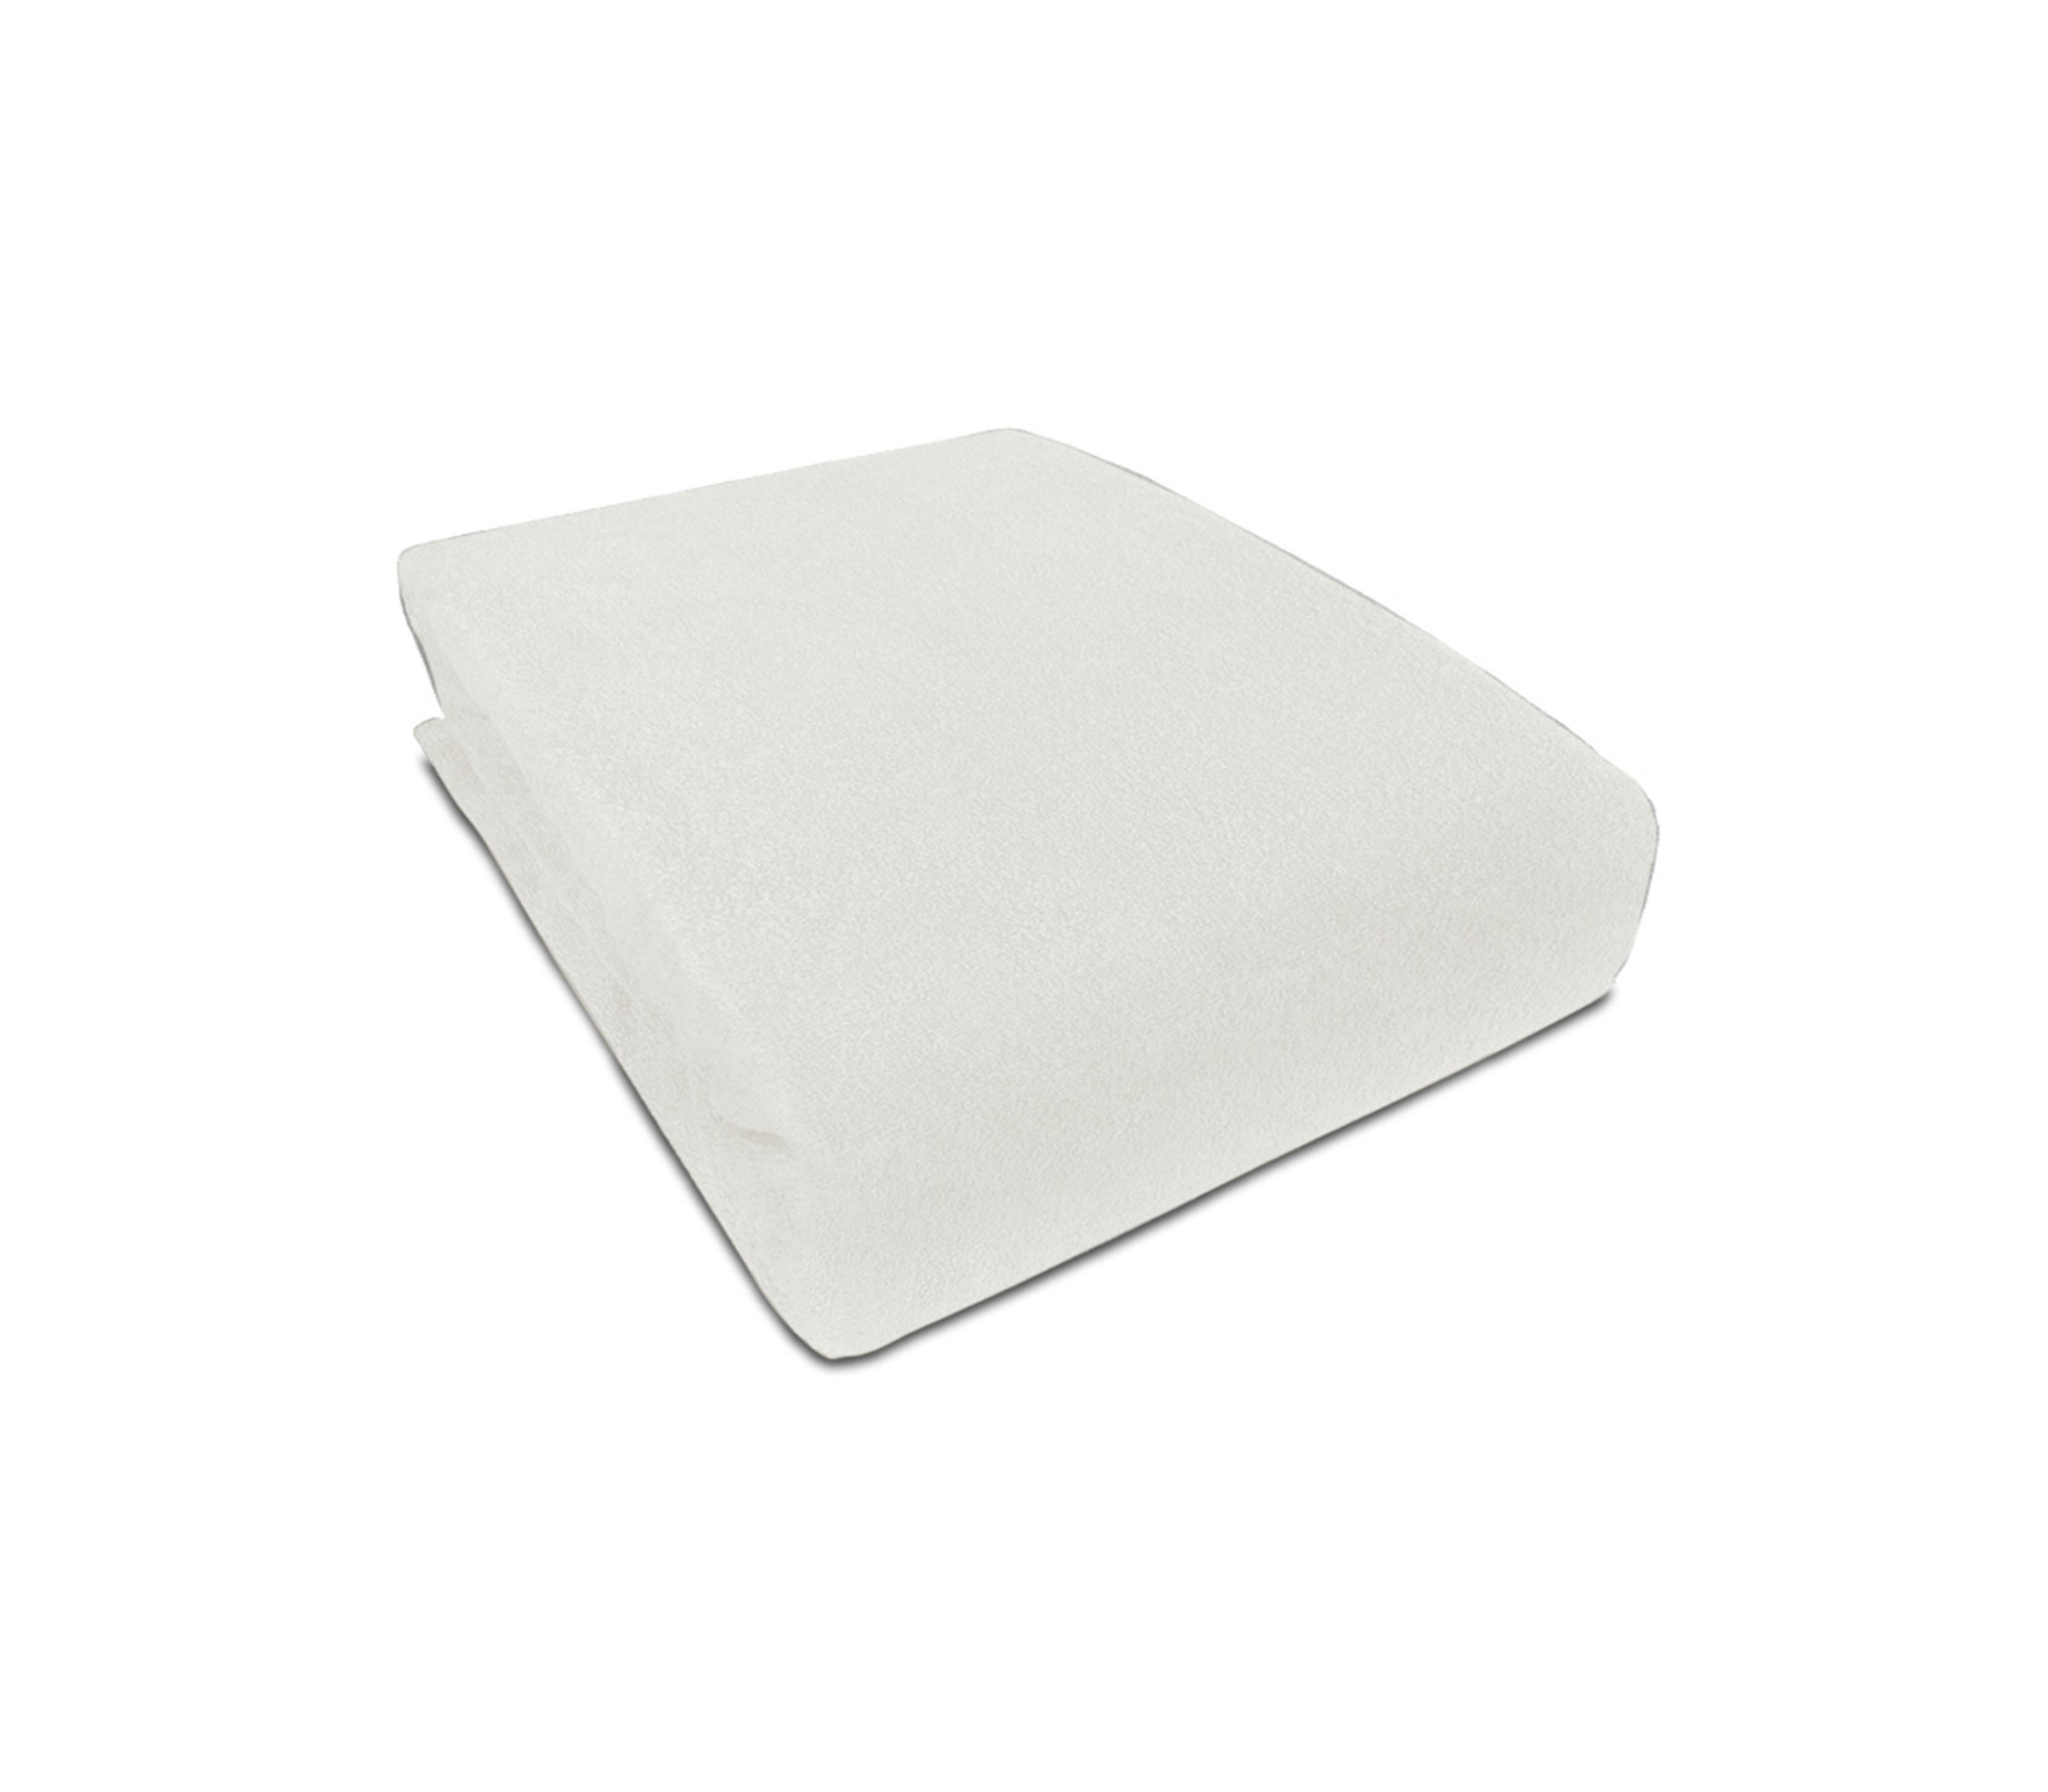 Aga prostěradlo FROTÉ 180X200 cm Barva prostěradla: Bílá